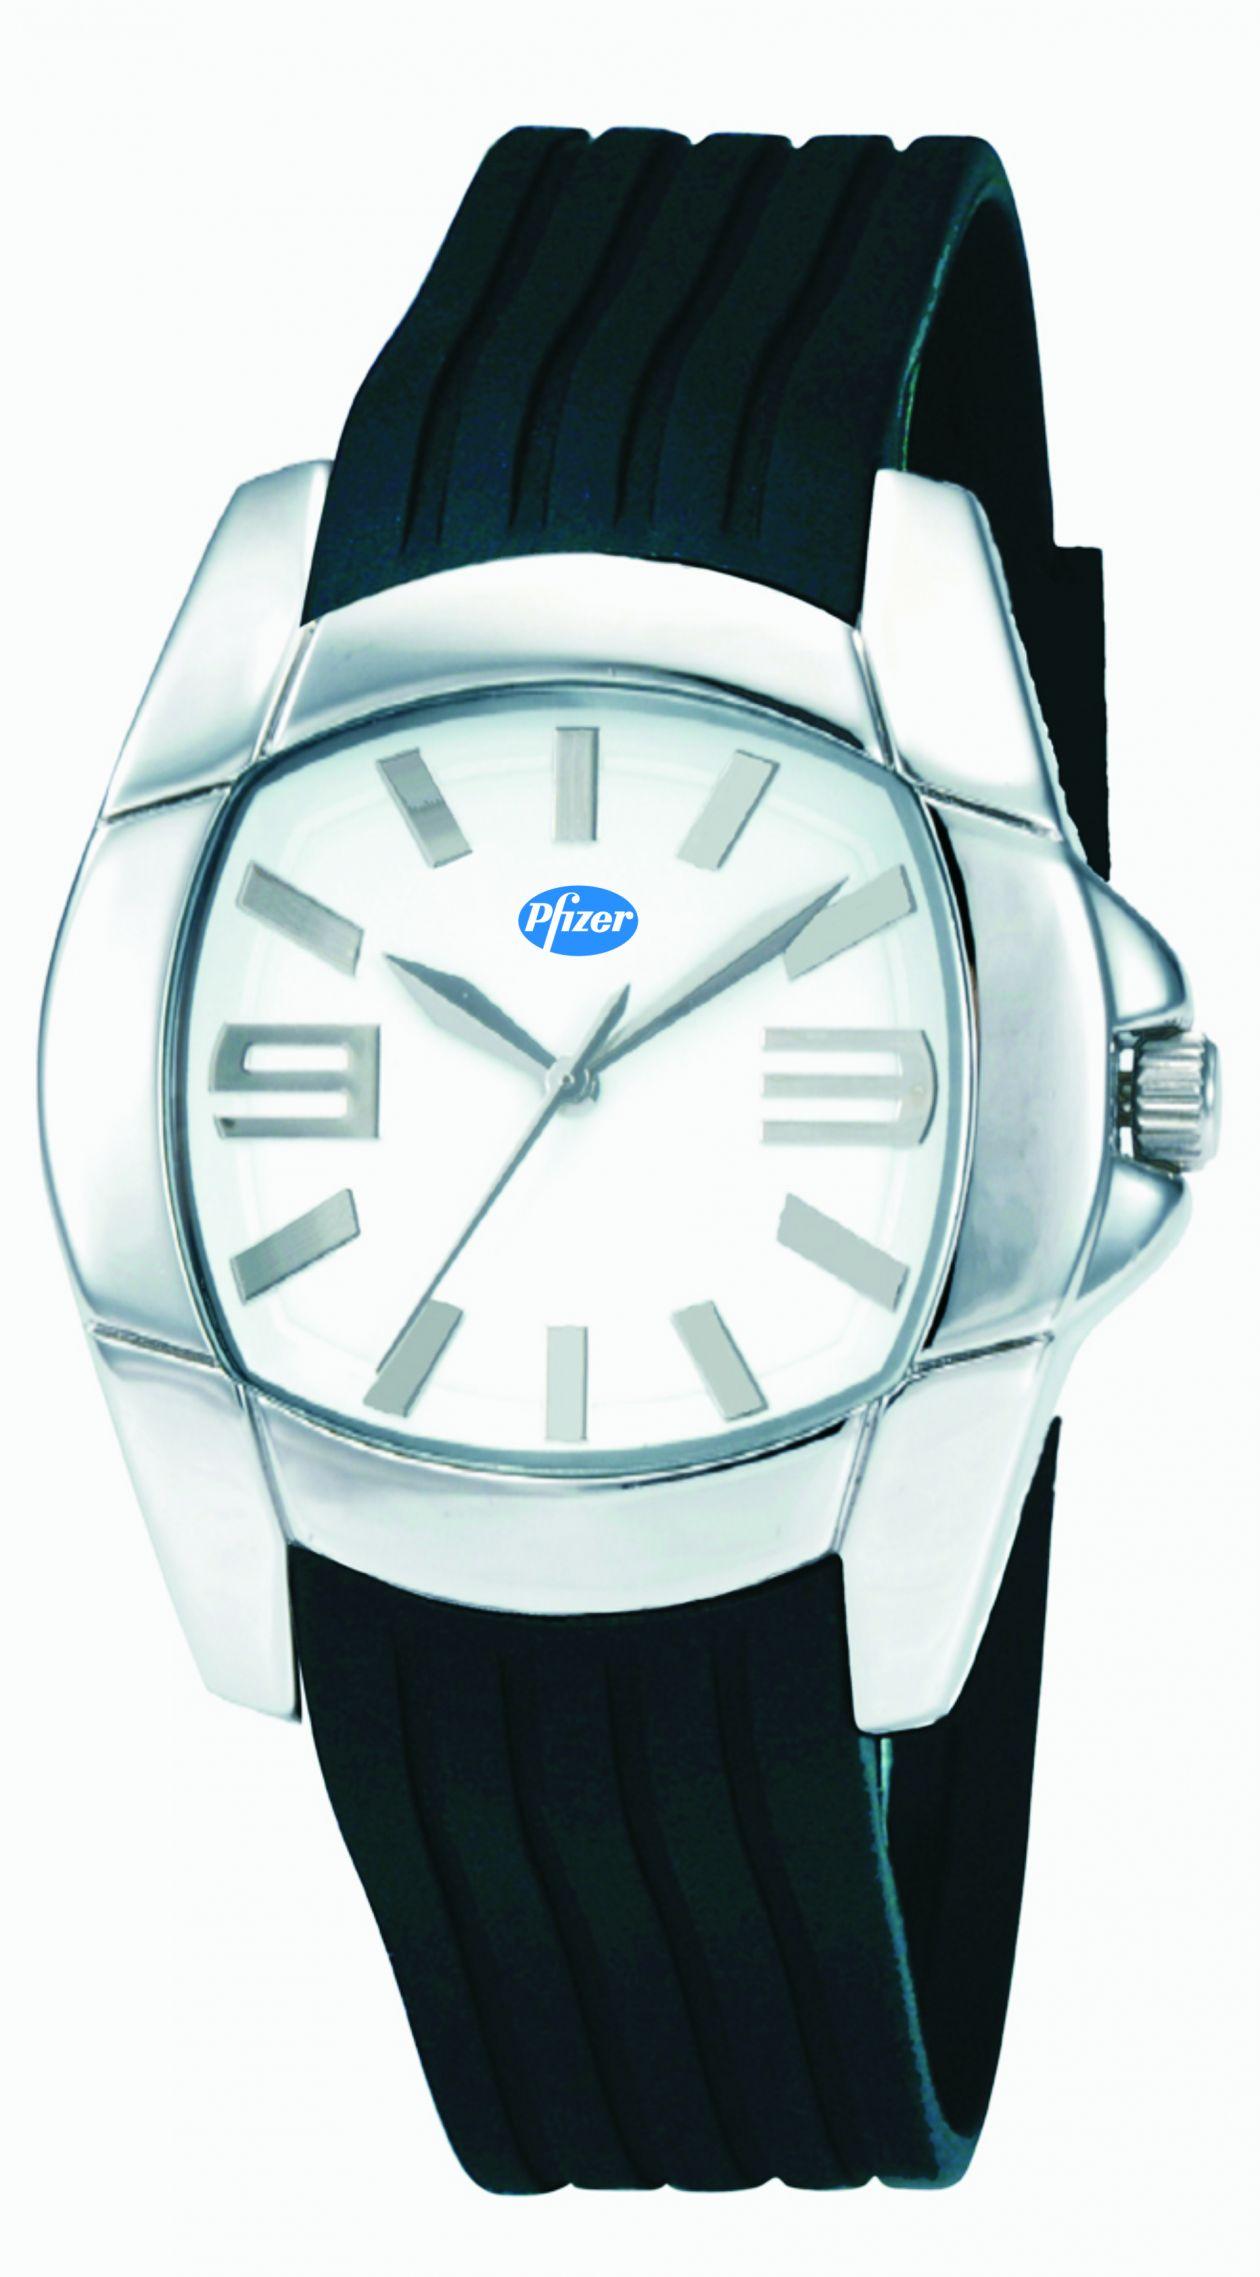 Pfizer reloj gabado por tampografía